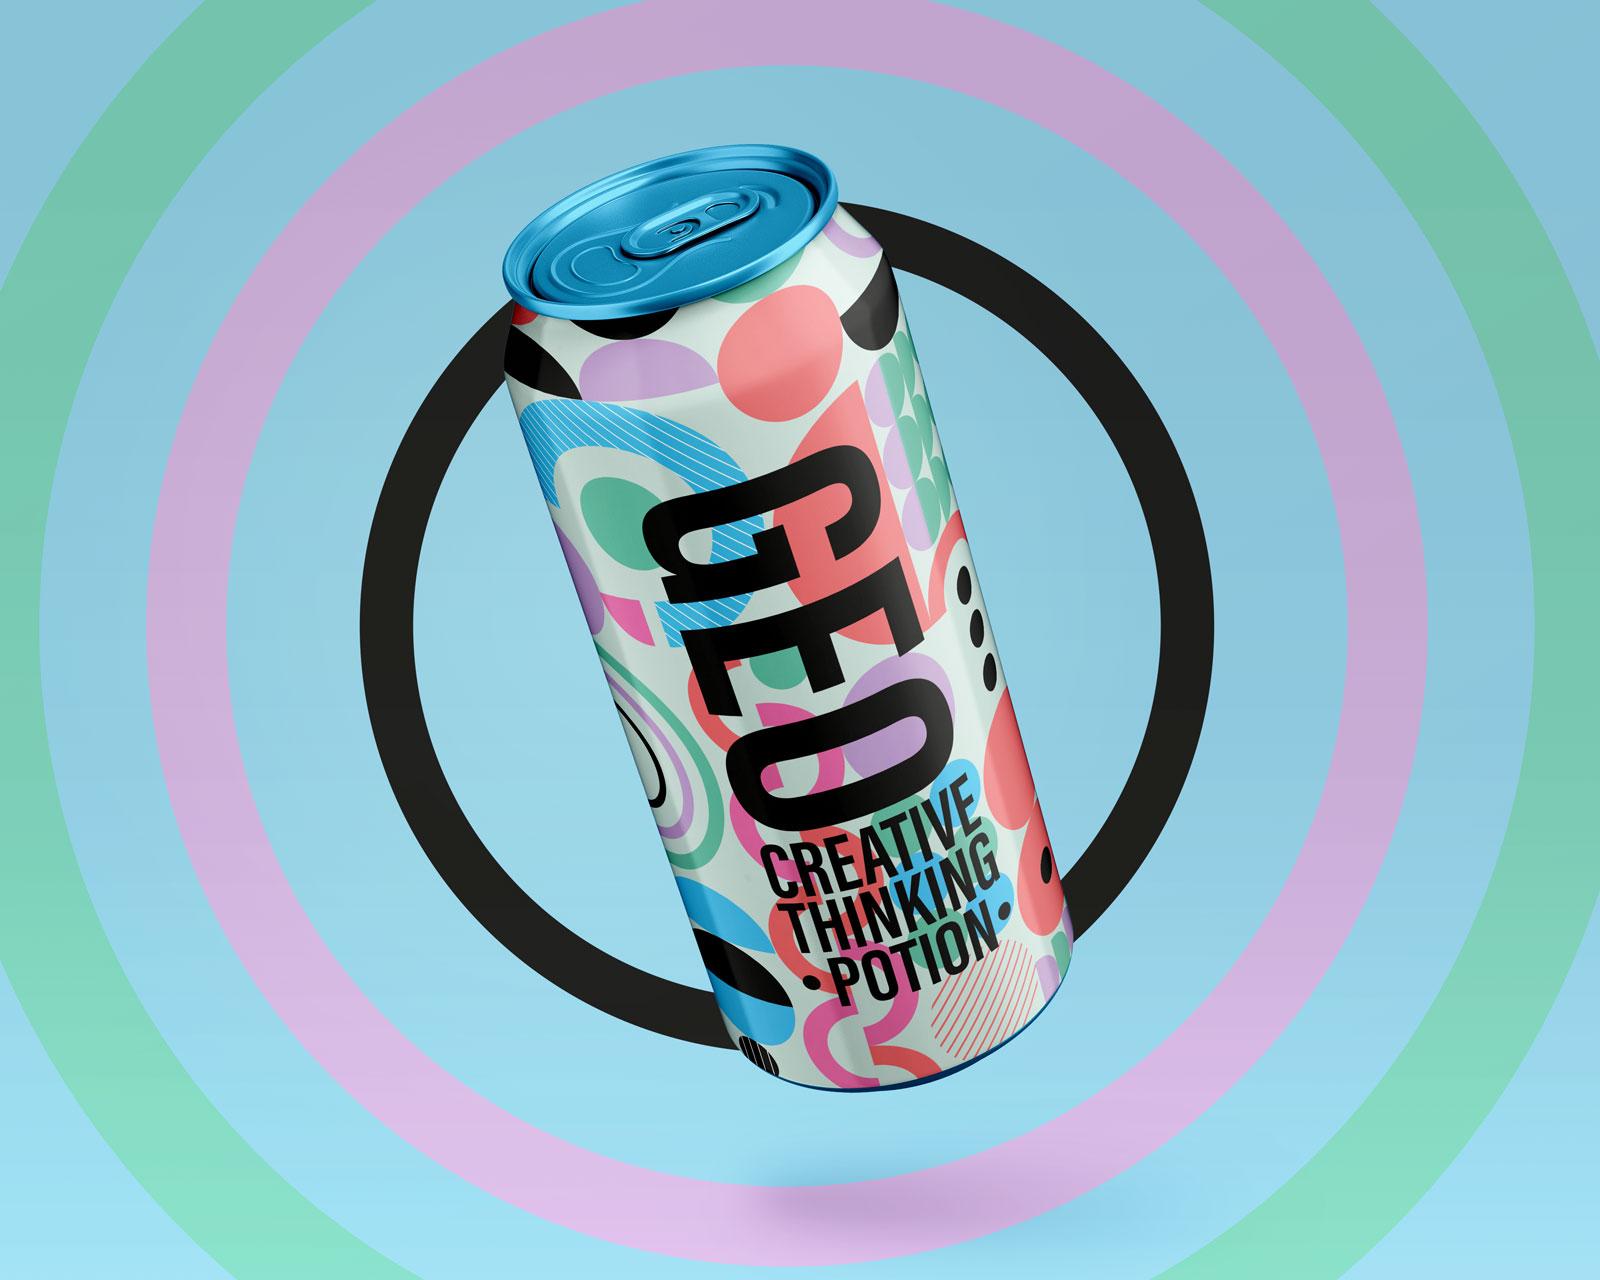 GEO - Creative Thinking Potion